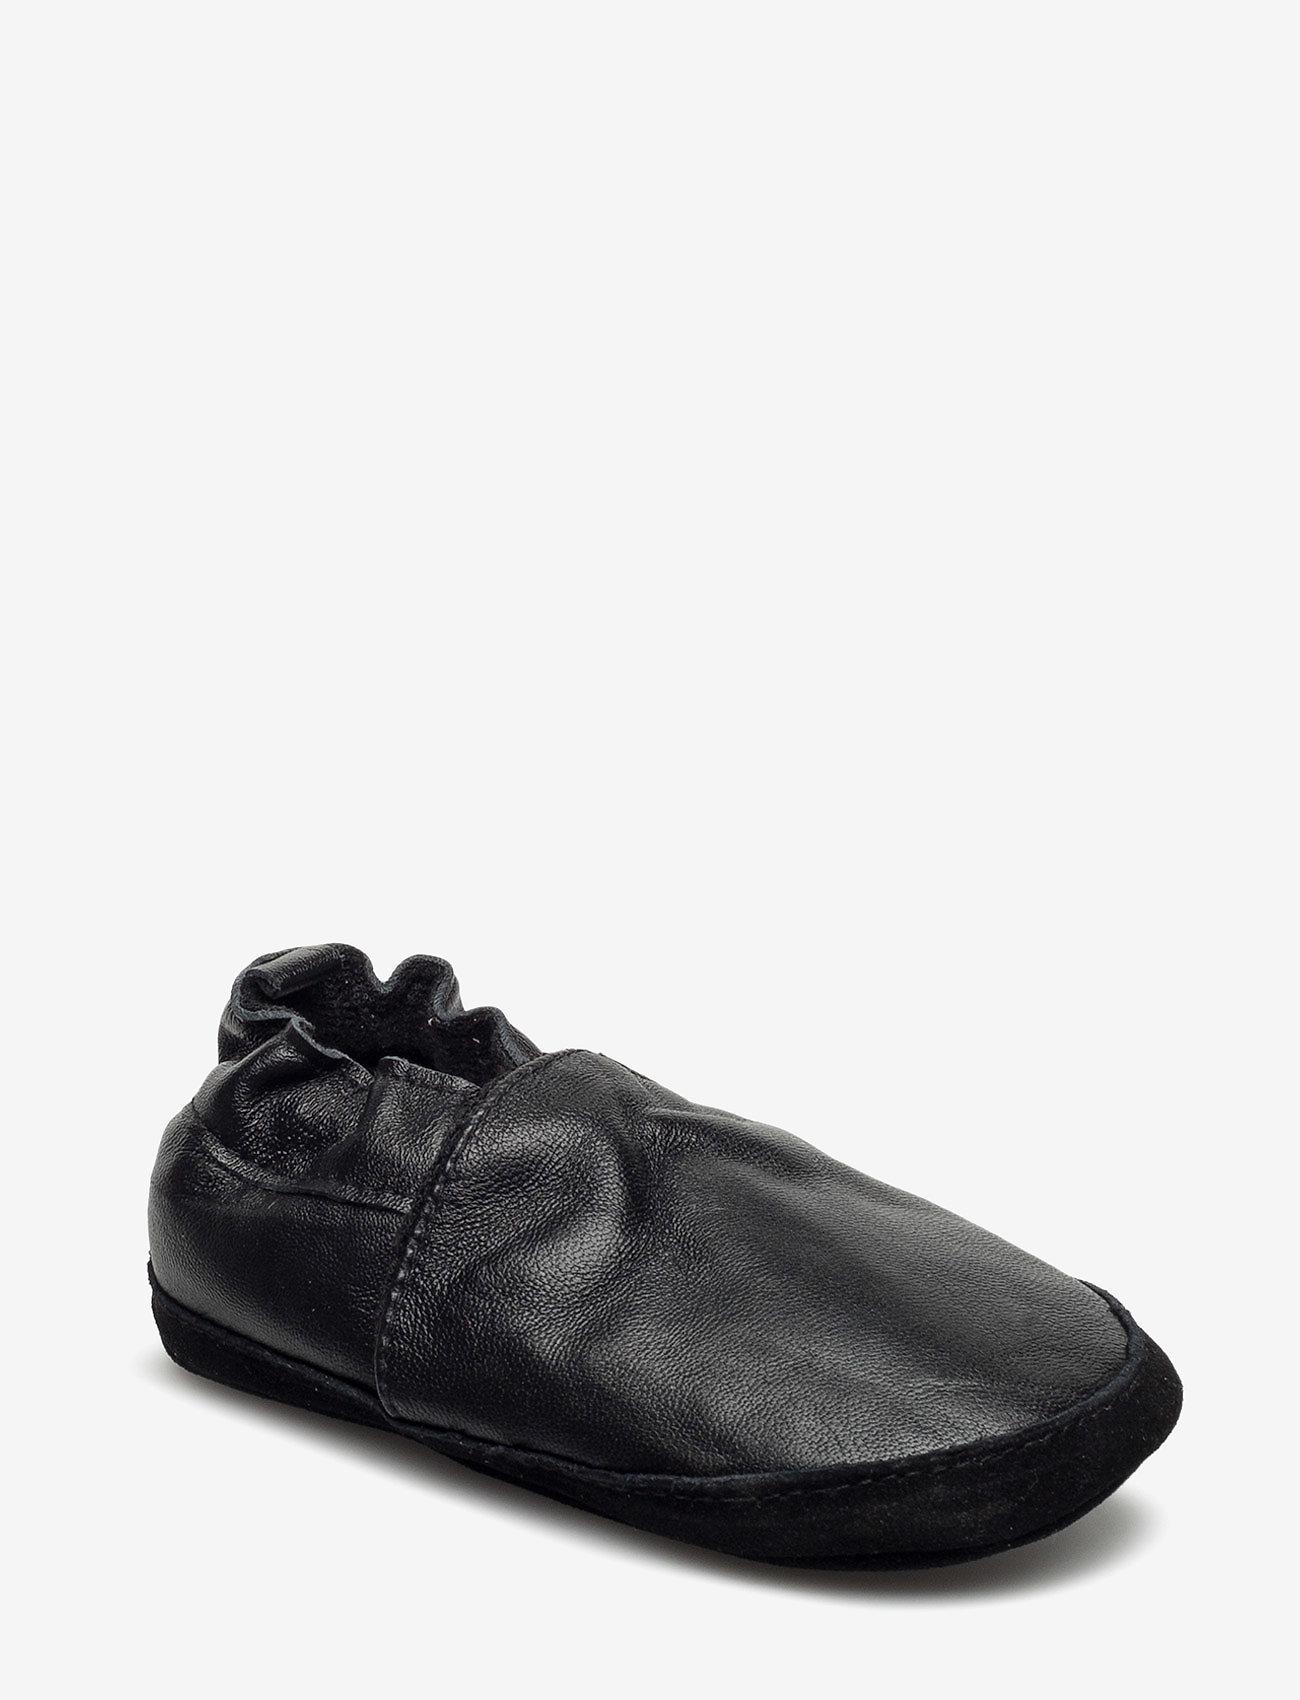 Melton - Leather shoe - Loafer - buty - 190/black - 0